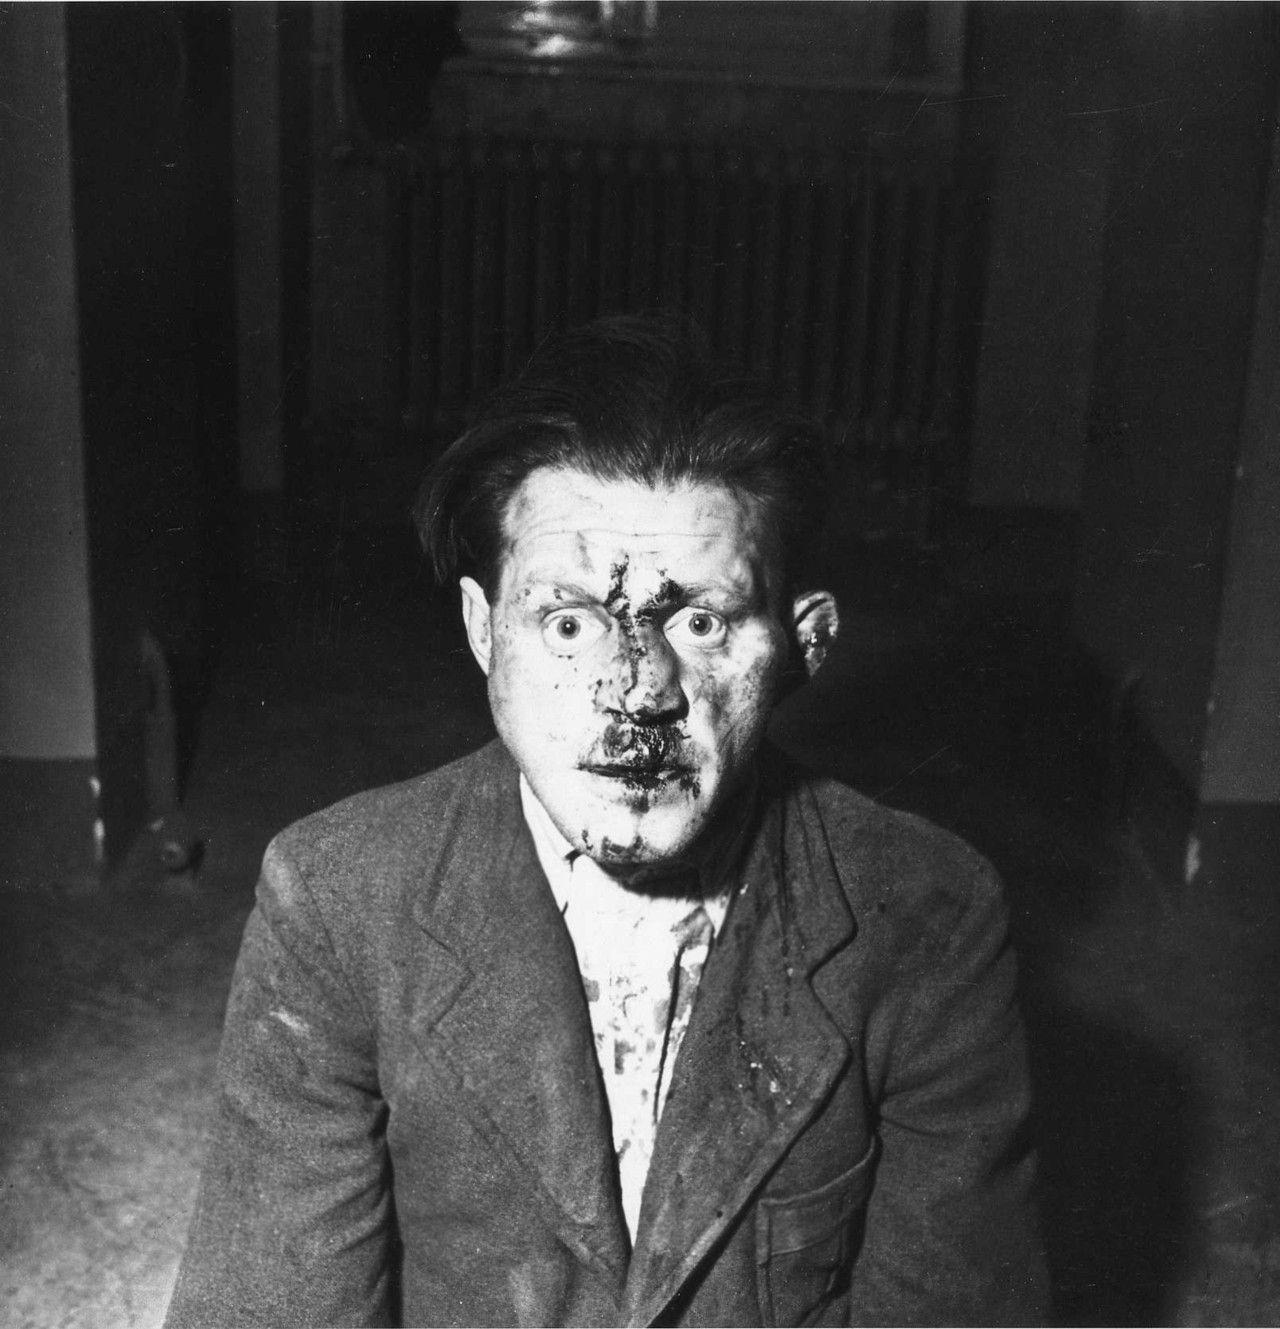 SS Prison Guard, Buchenwald, April 1945 by Lee Miller ...